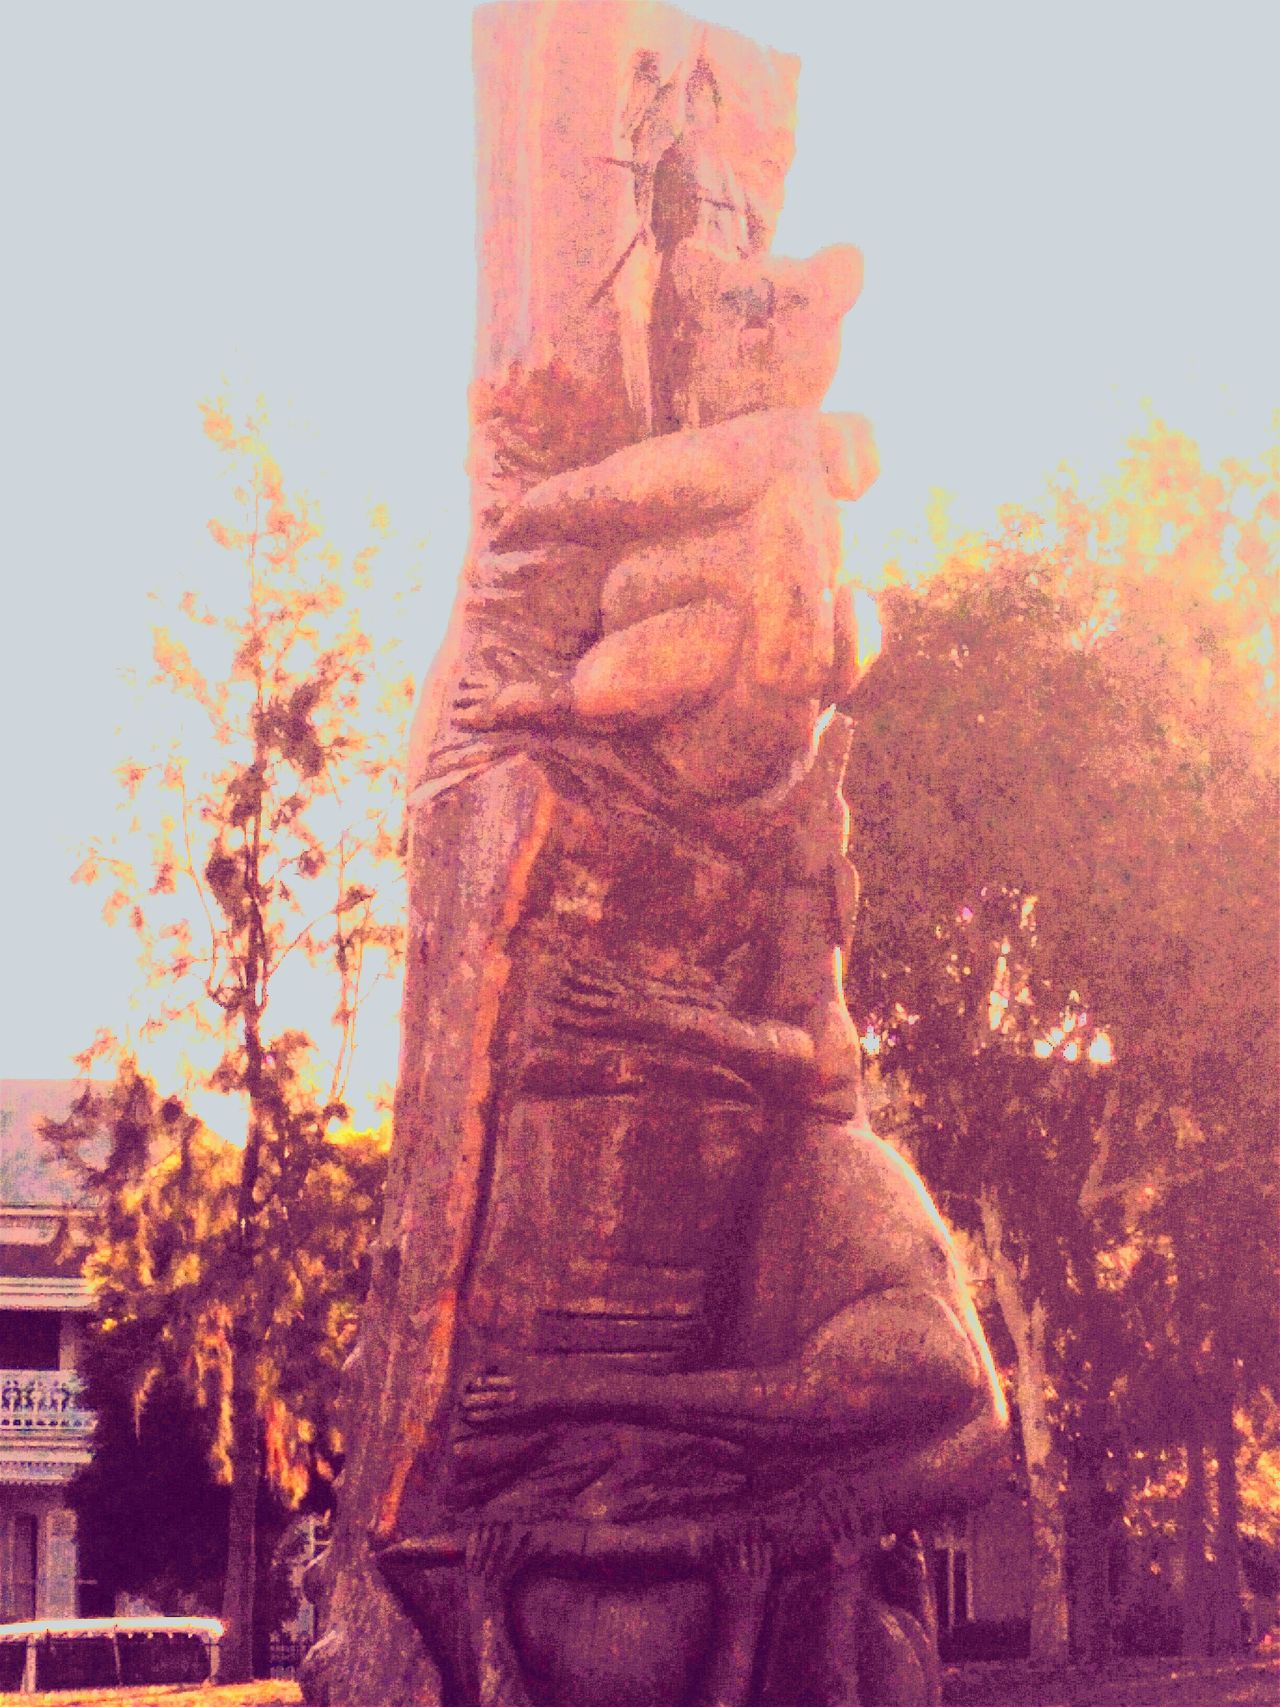 Treen Wood Carving Sculpture WoodArt Art Sculptures Tree Art Tree Carving TreenArt Carved In Wood Carved Wooden Figures Wood Carving Art Woodcarving Wooden Art Wooden Sculpture Carved Wood Woodwork  Carved Tree Woodensculpture Carvedwoodenfigures Carvedinwood Street Photography Streetphotography Wooden Sculpure Treenporn